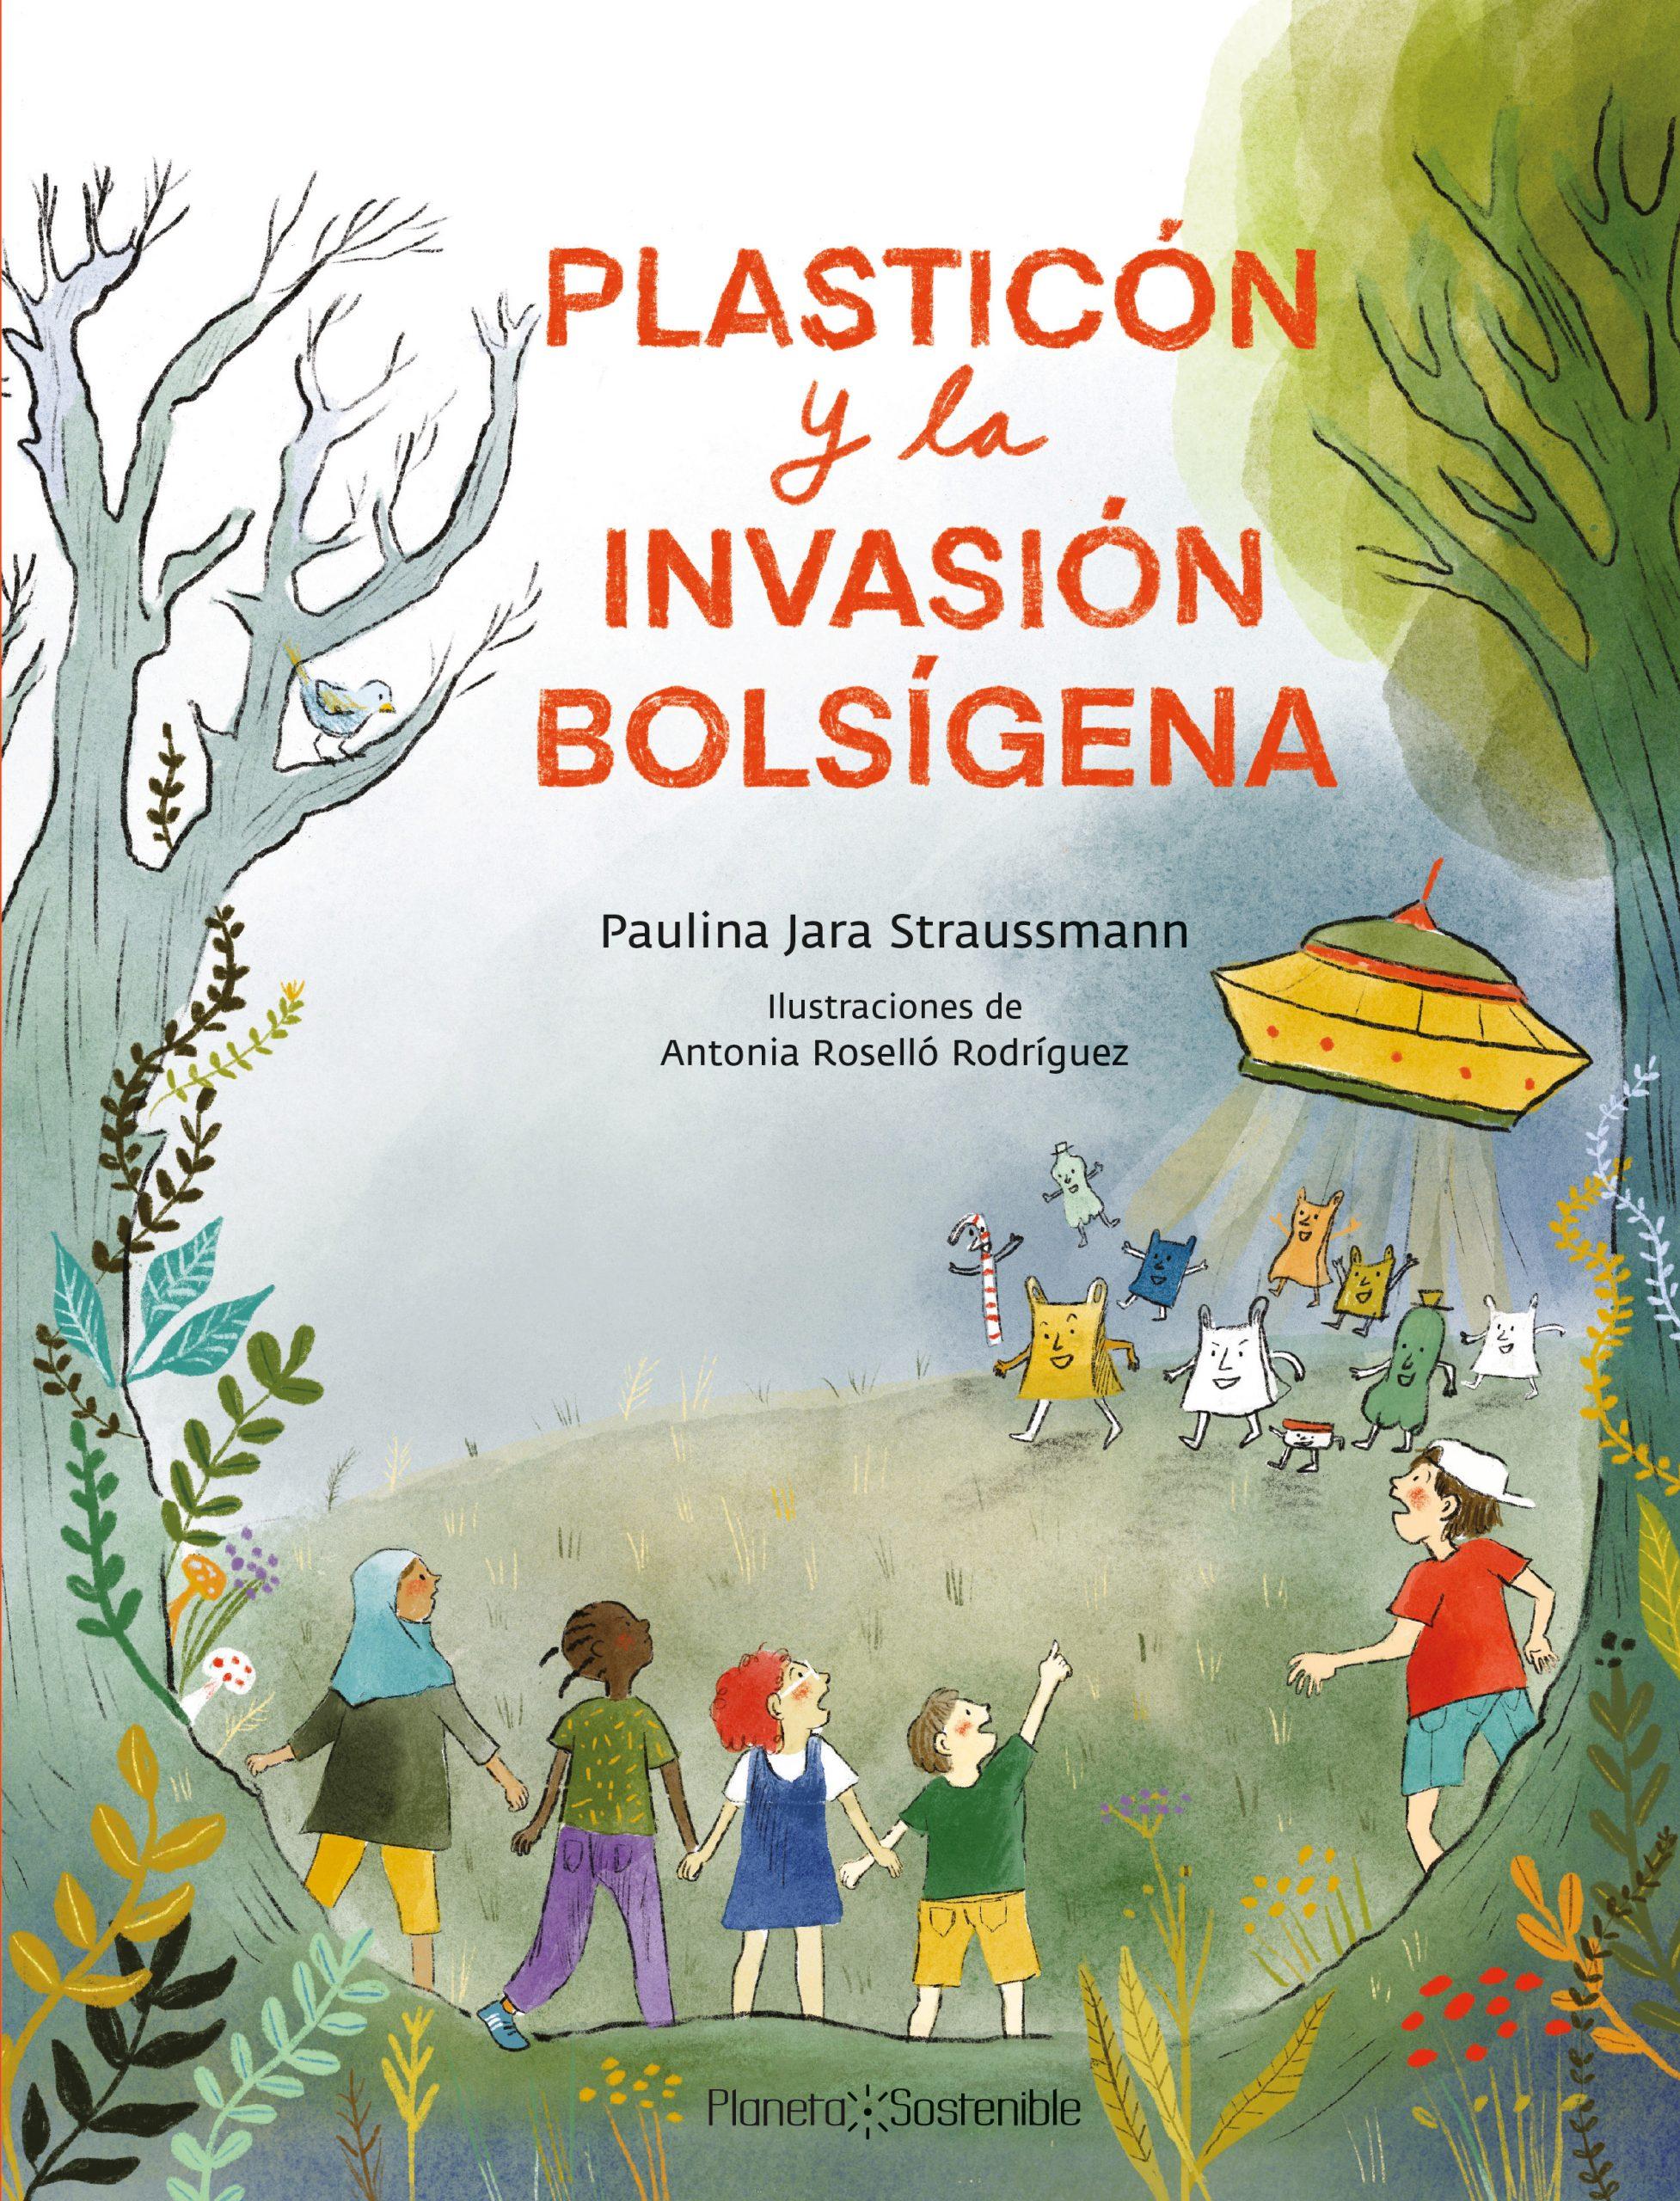 PLASTICON Y LA INVASION BOLSIGENA